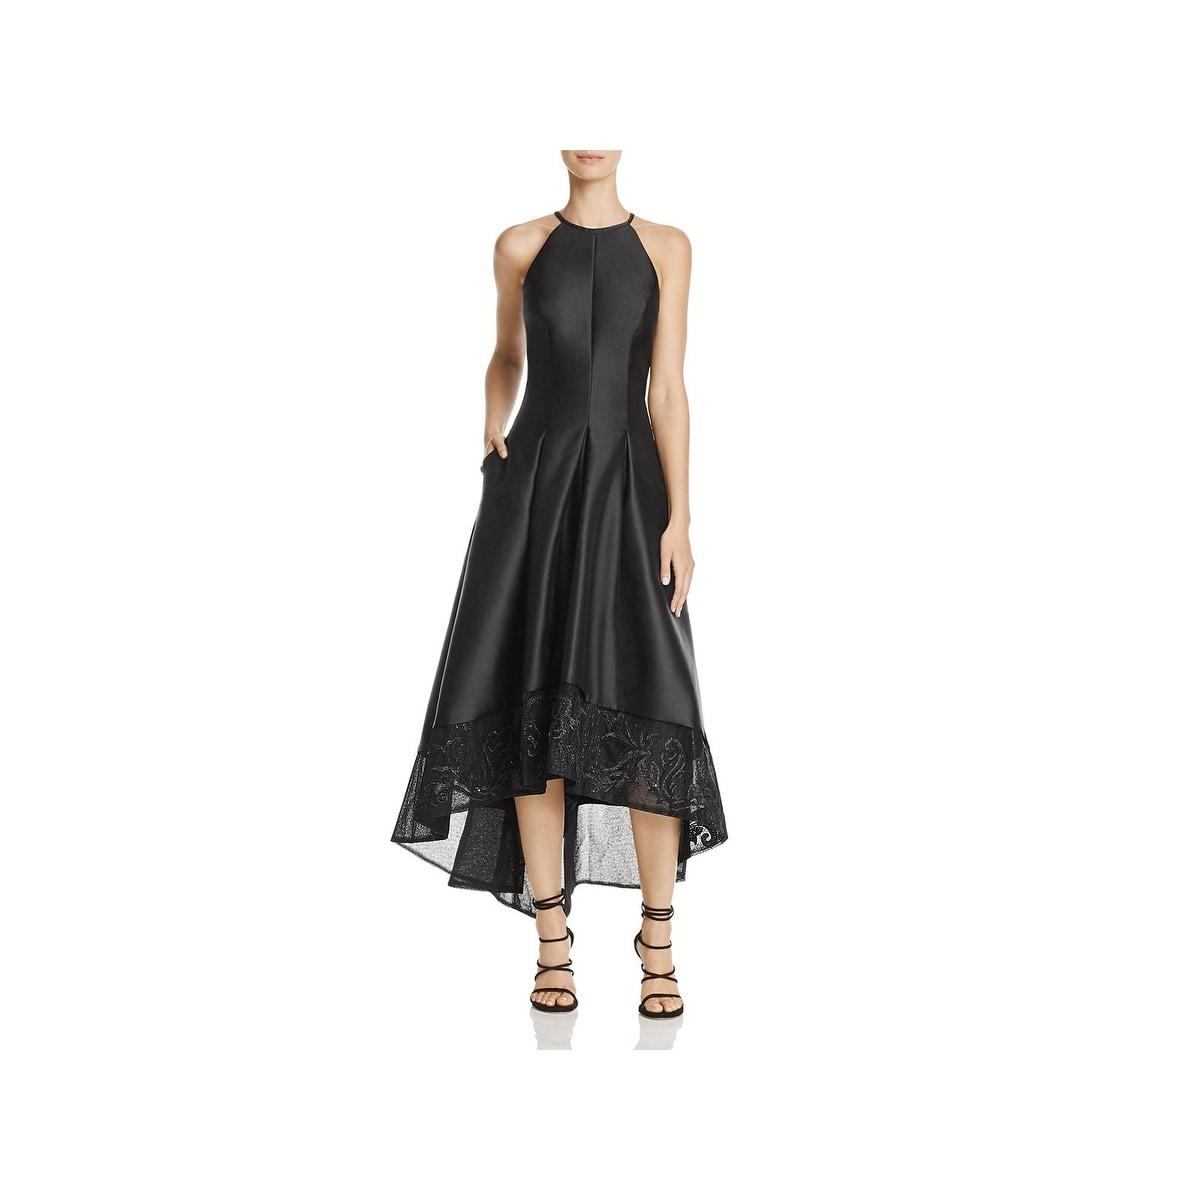 a423409896 Buy Carmen Marc Valvo Evening   Formal Dresses Online at Overstock ...